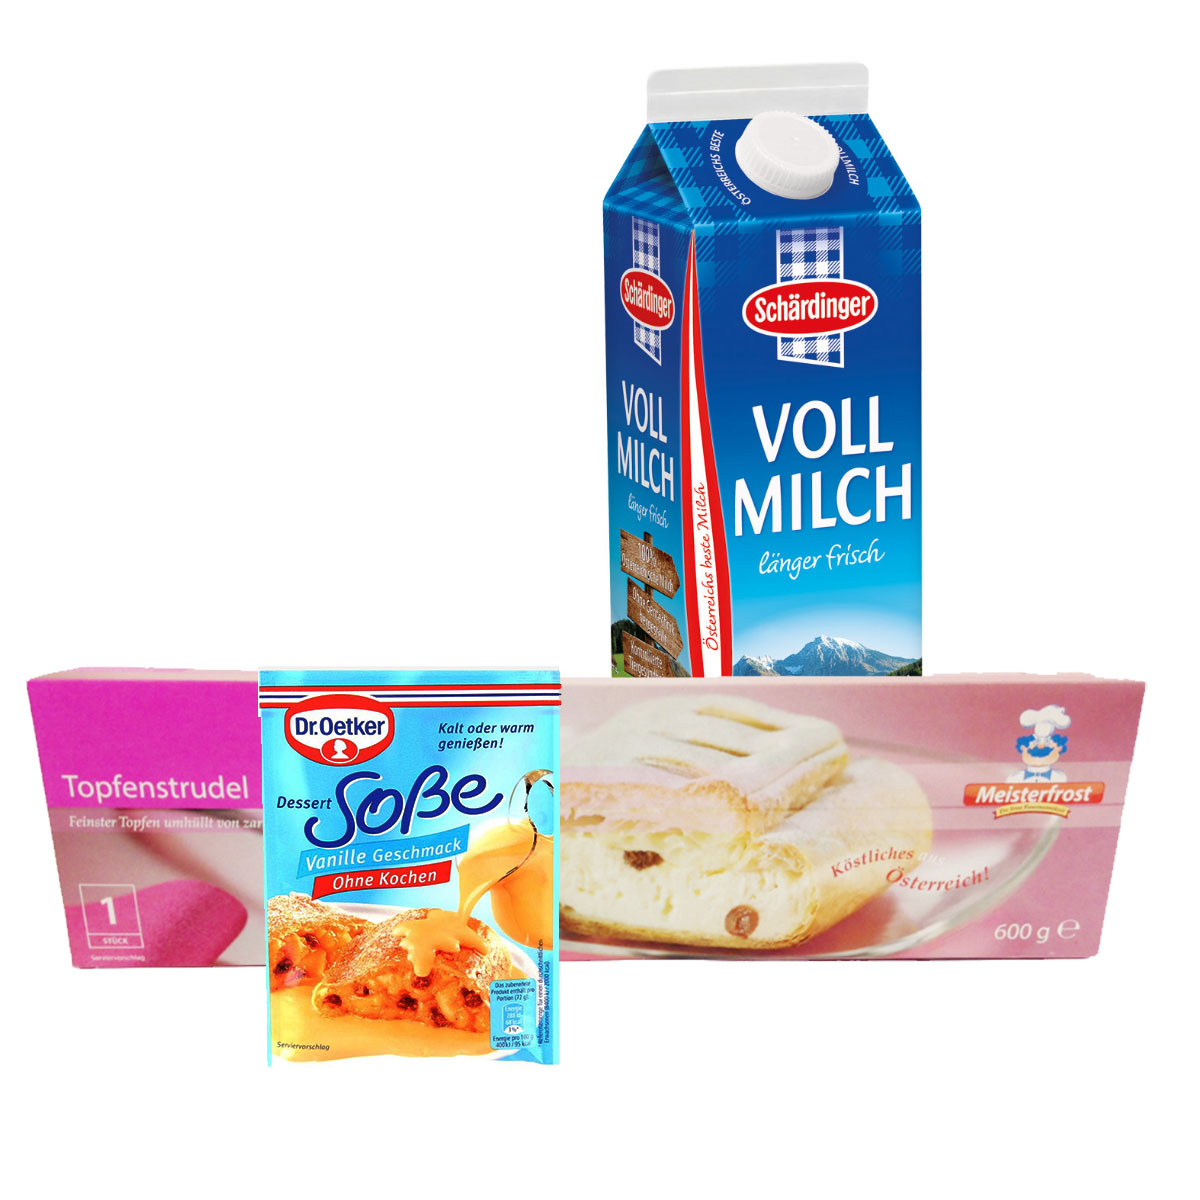 Topfenstrudel Mit Vanillesauce Im Unimarkt Online Shop Bestellen